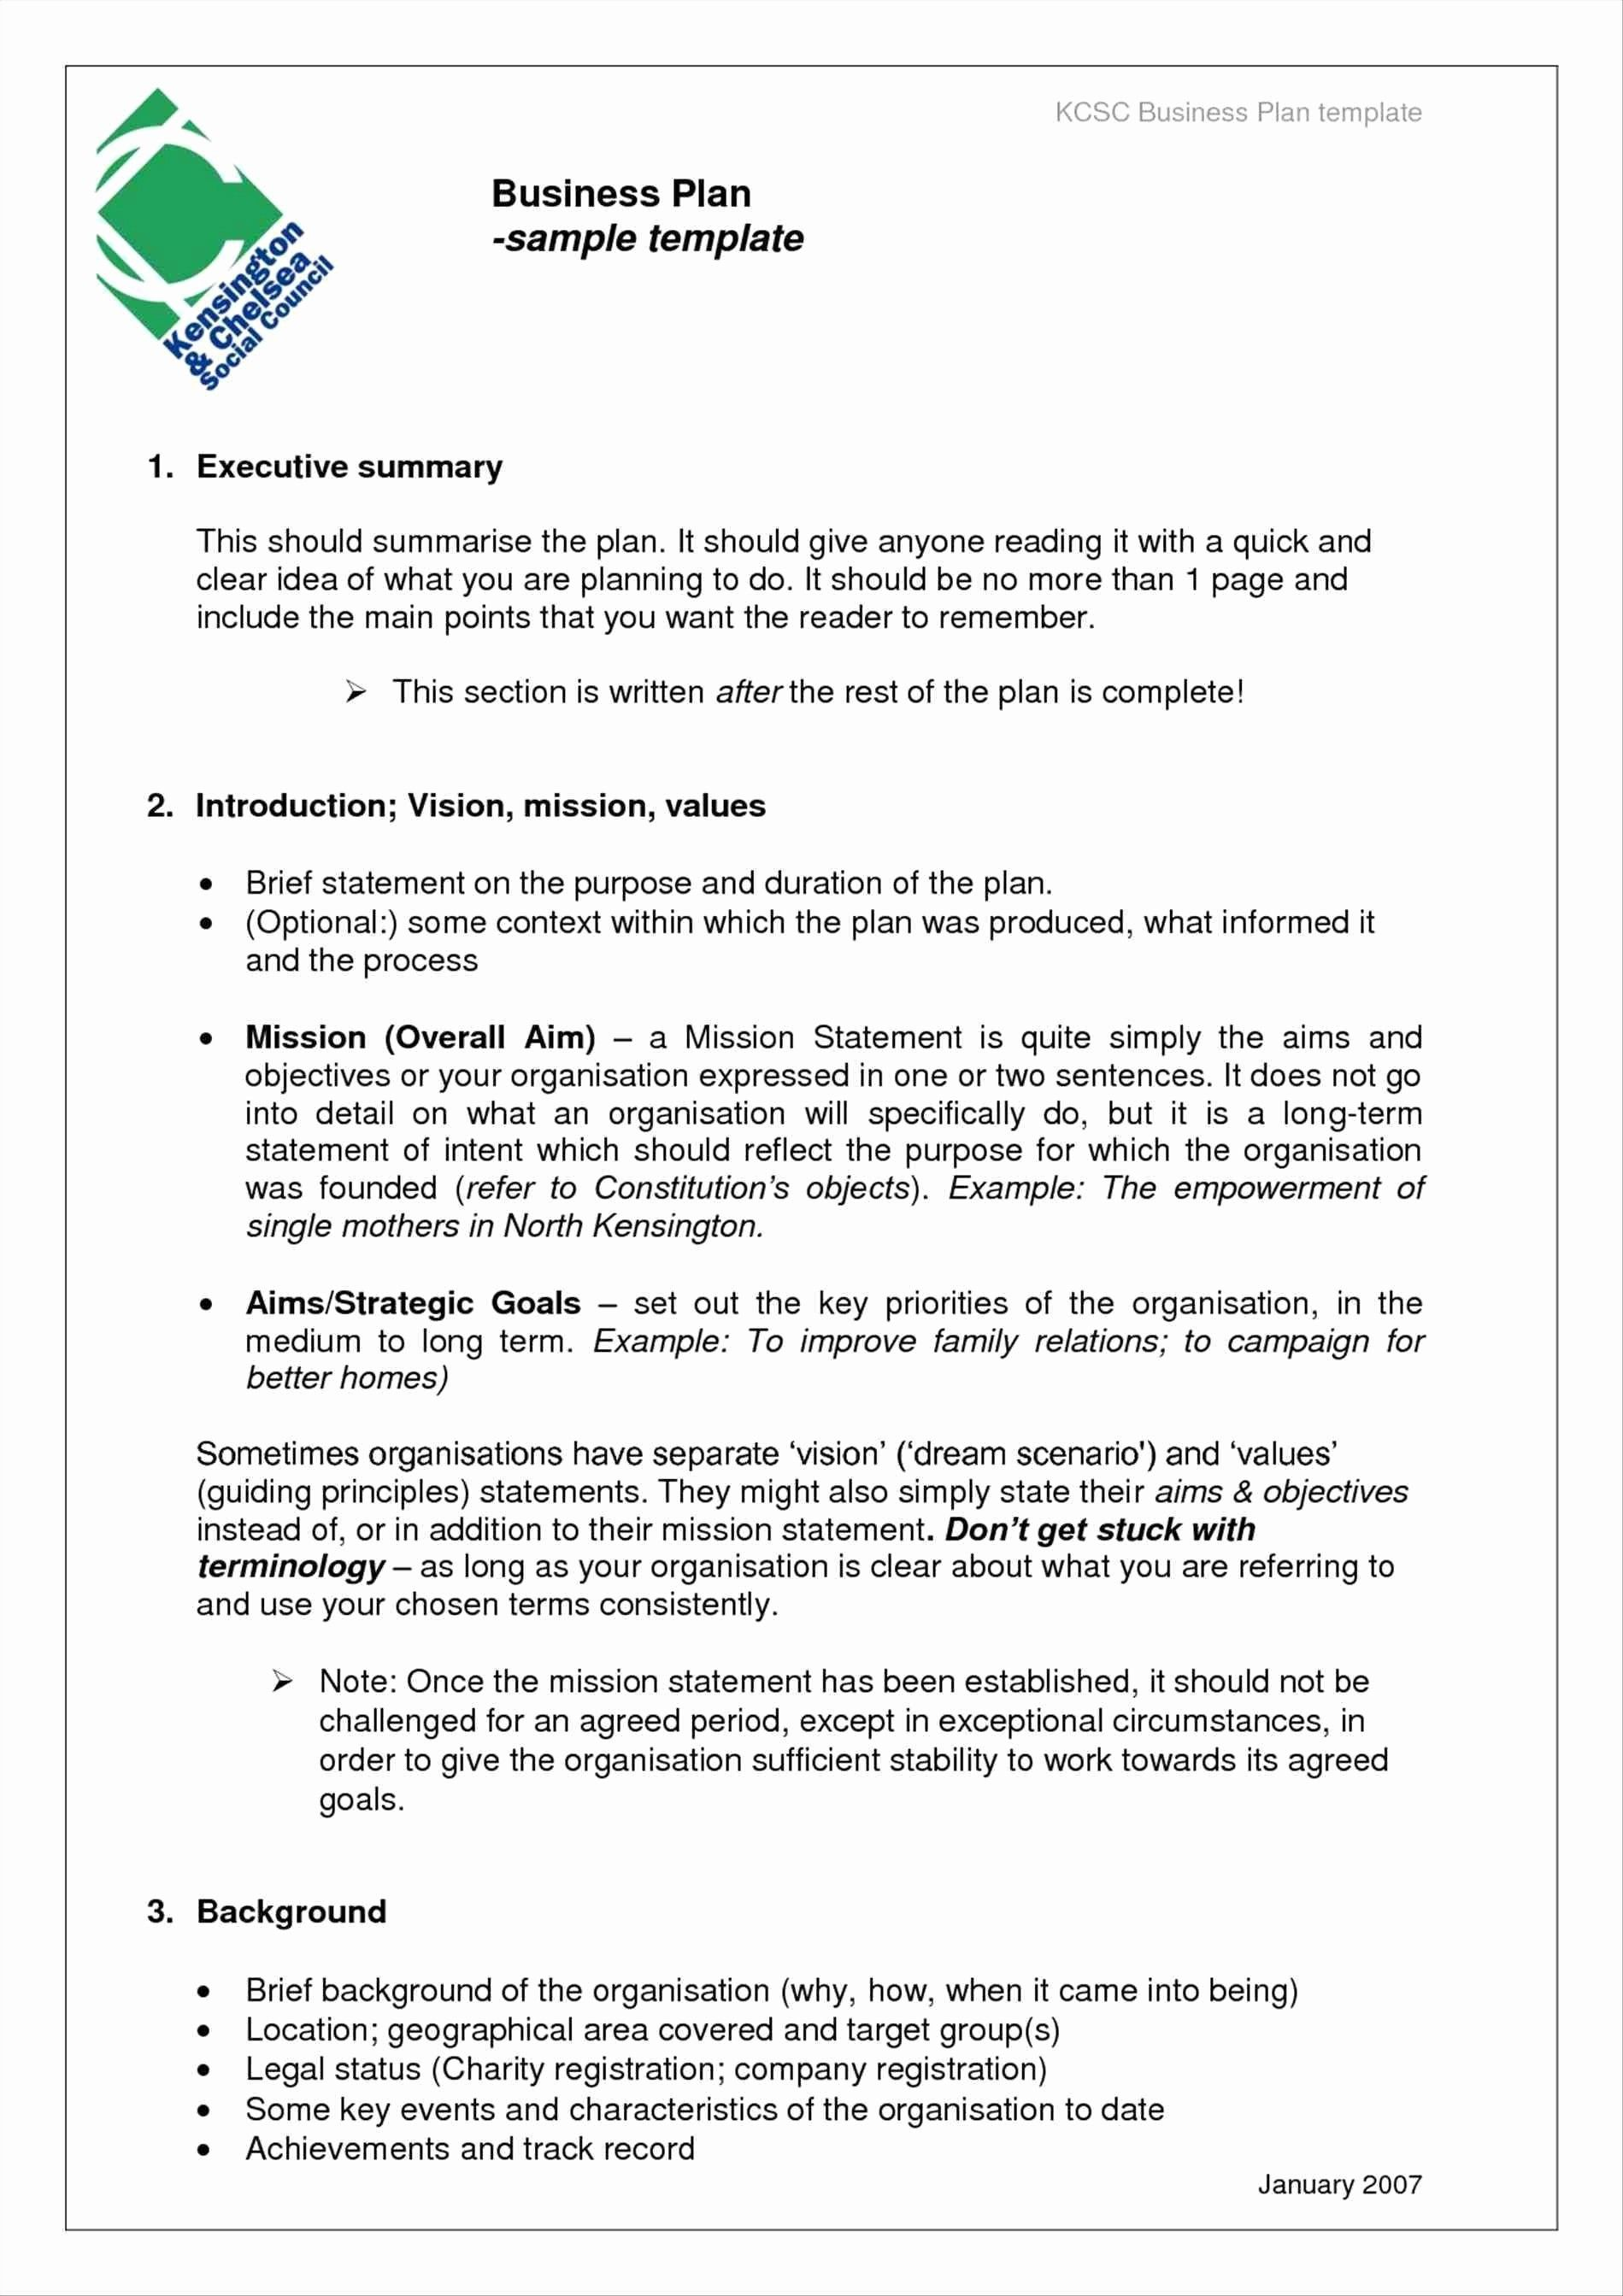 Valid Life Coach Business Plan Template | Business plan template ...